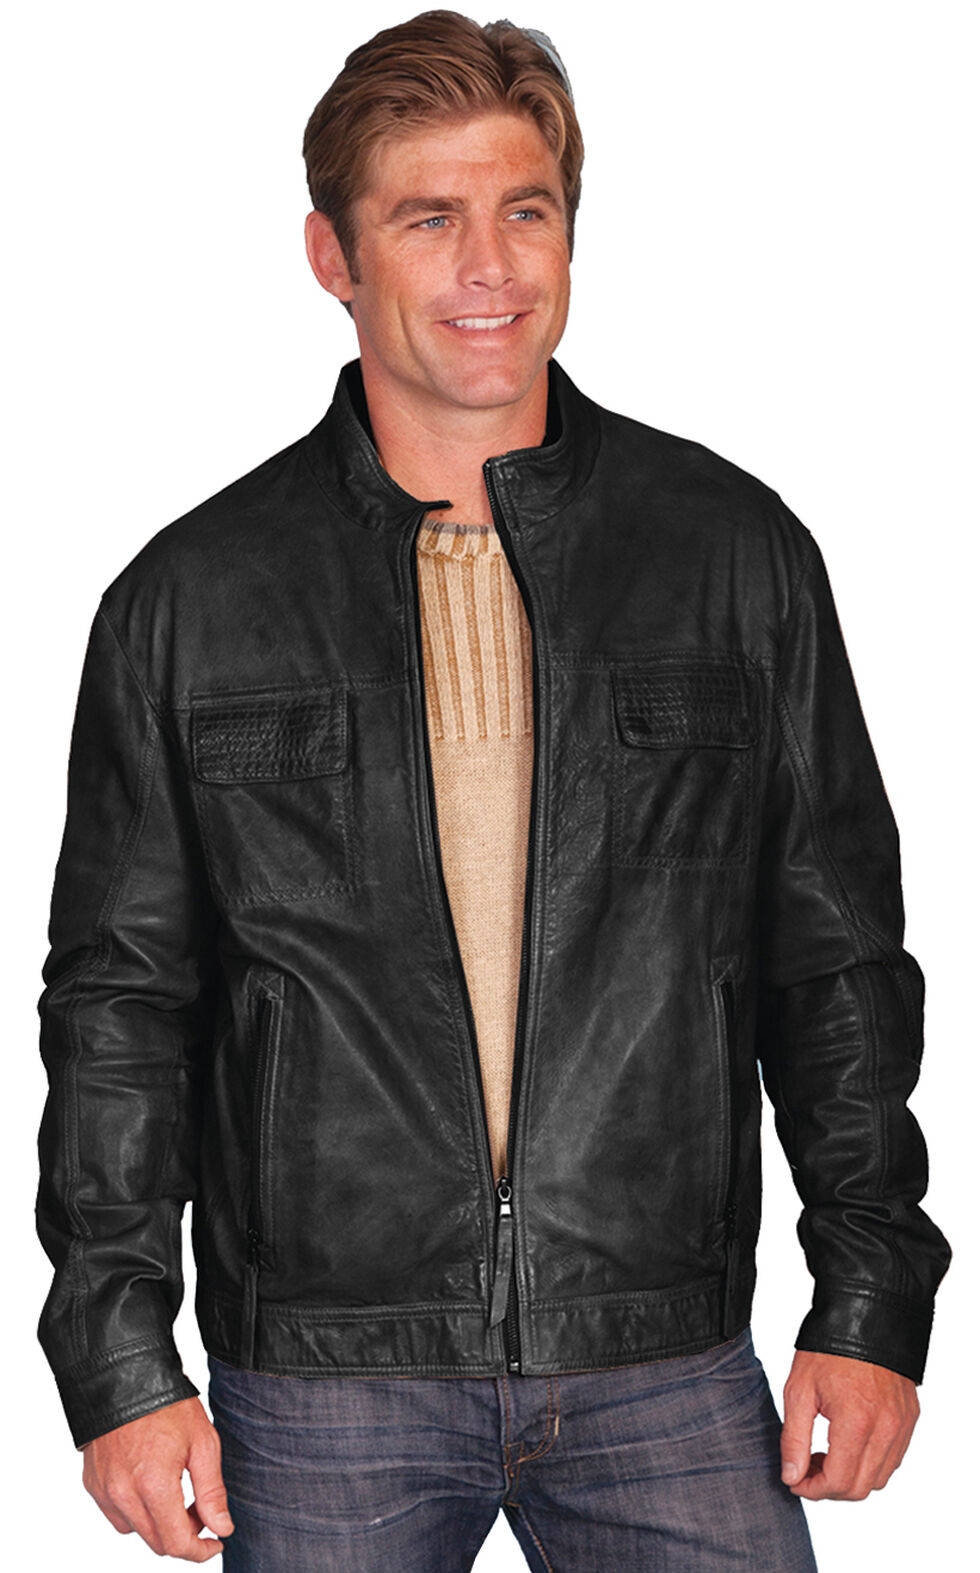 Scully Leatherwear Men's Black Leather Jacket, Black, hi-res